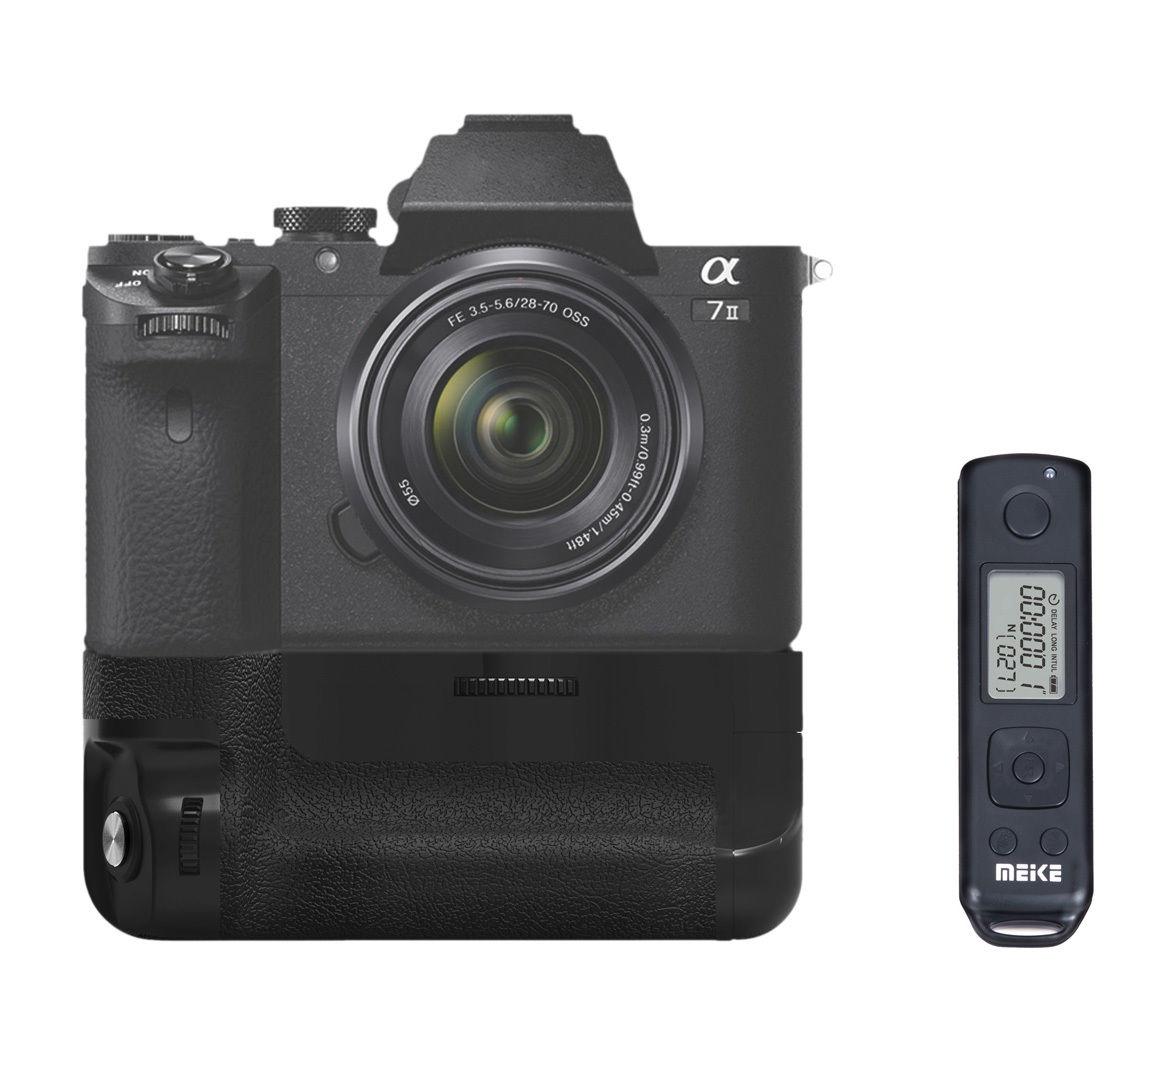 Meike MK A7II Pro inalámbrica incorporada Control empuñadura de batería para Sony A7 II A7R II A7S II para Sony VG C2EM-in empuñadura de batería from Productos electrónicos on AliExpress - 11.11_Double 11_Singles' Day 1